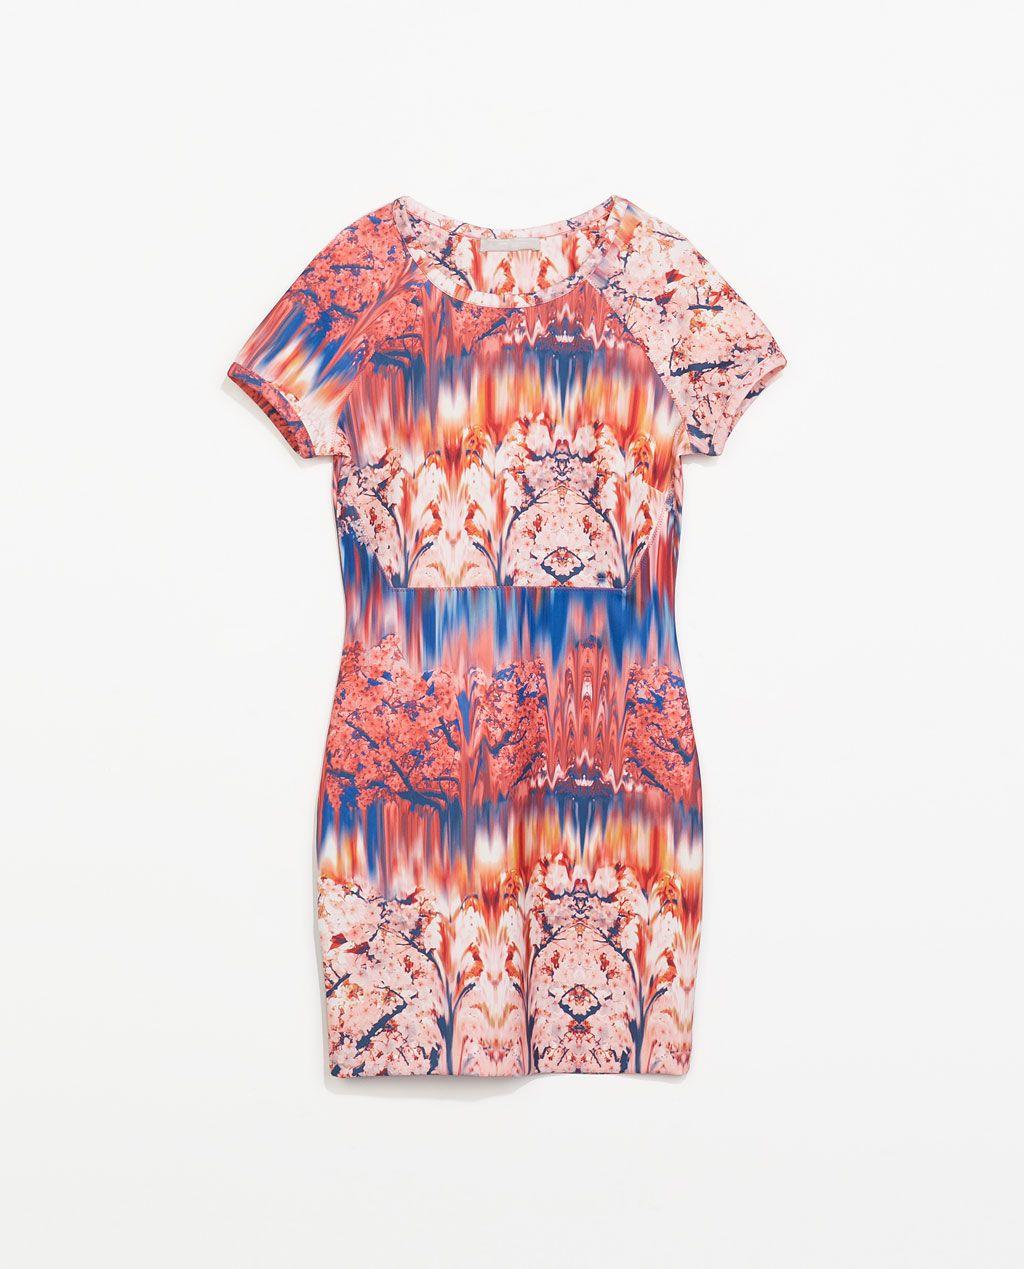 a30c0eb6443f Image 7 of NEOPRENE PRINTED DRESS from Zara